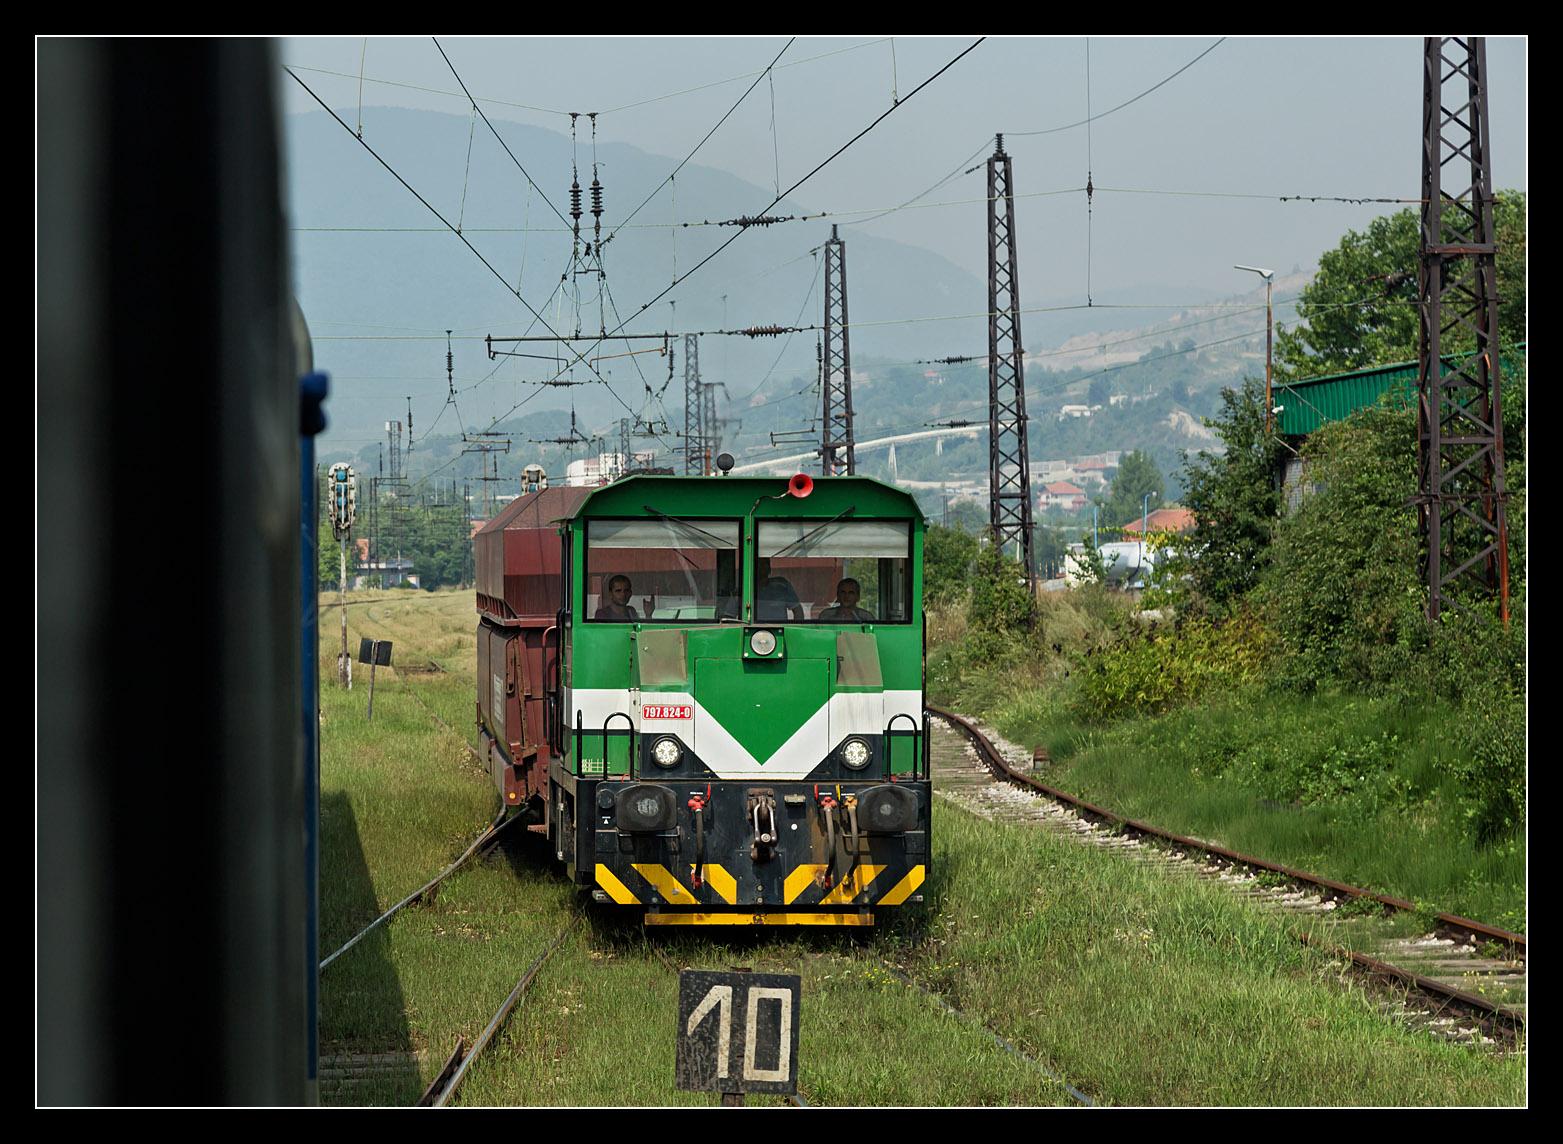 http://raildata.info/heck/adria1940.jpg